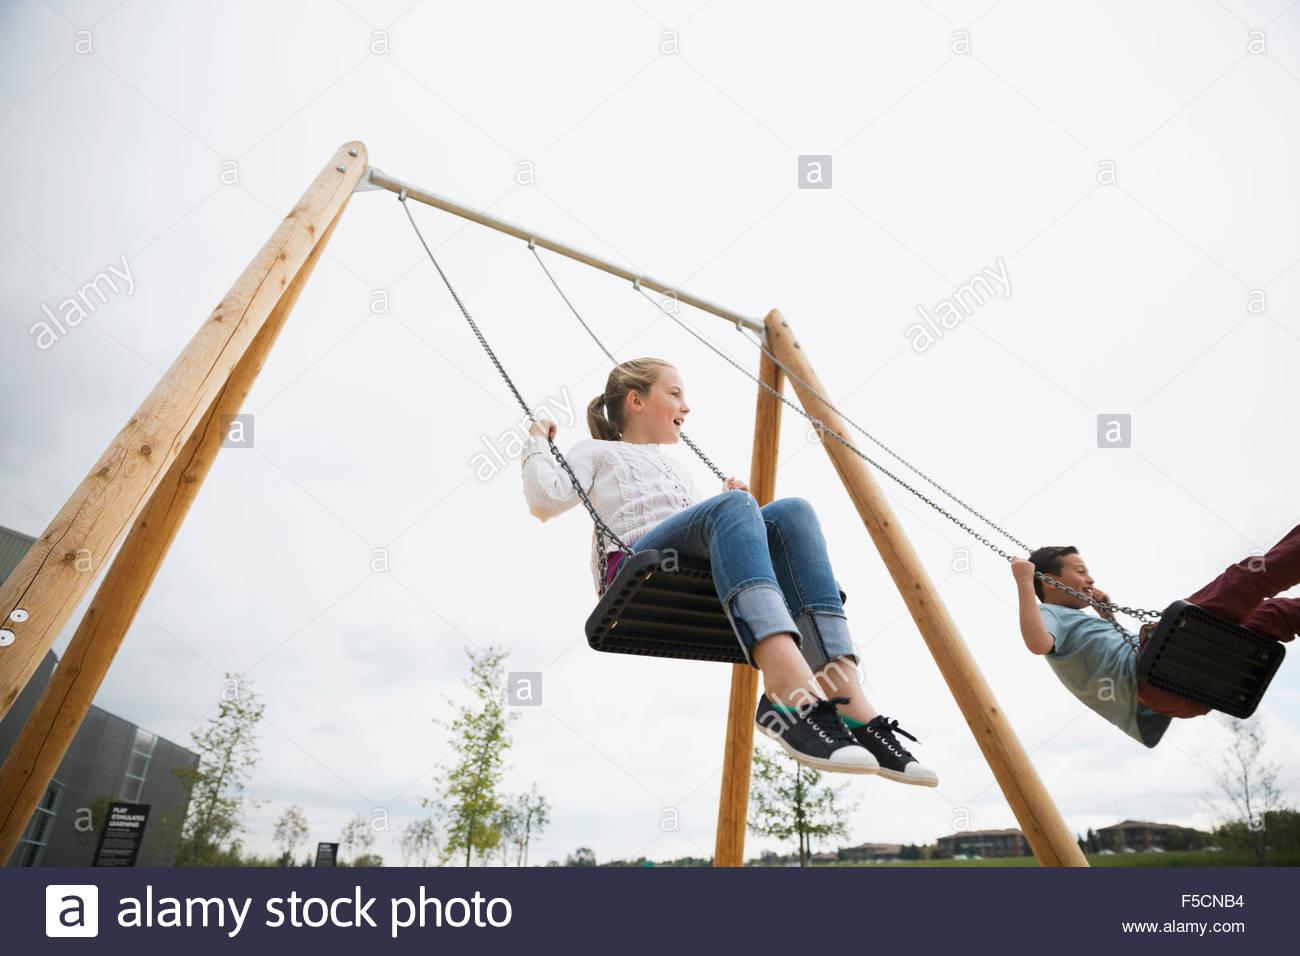 Boy and girl swinging at playground - Stock Image